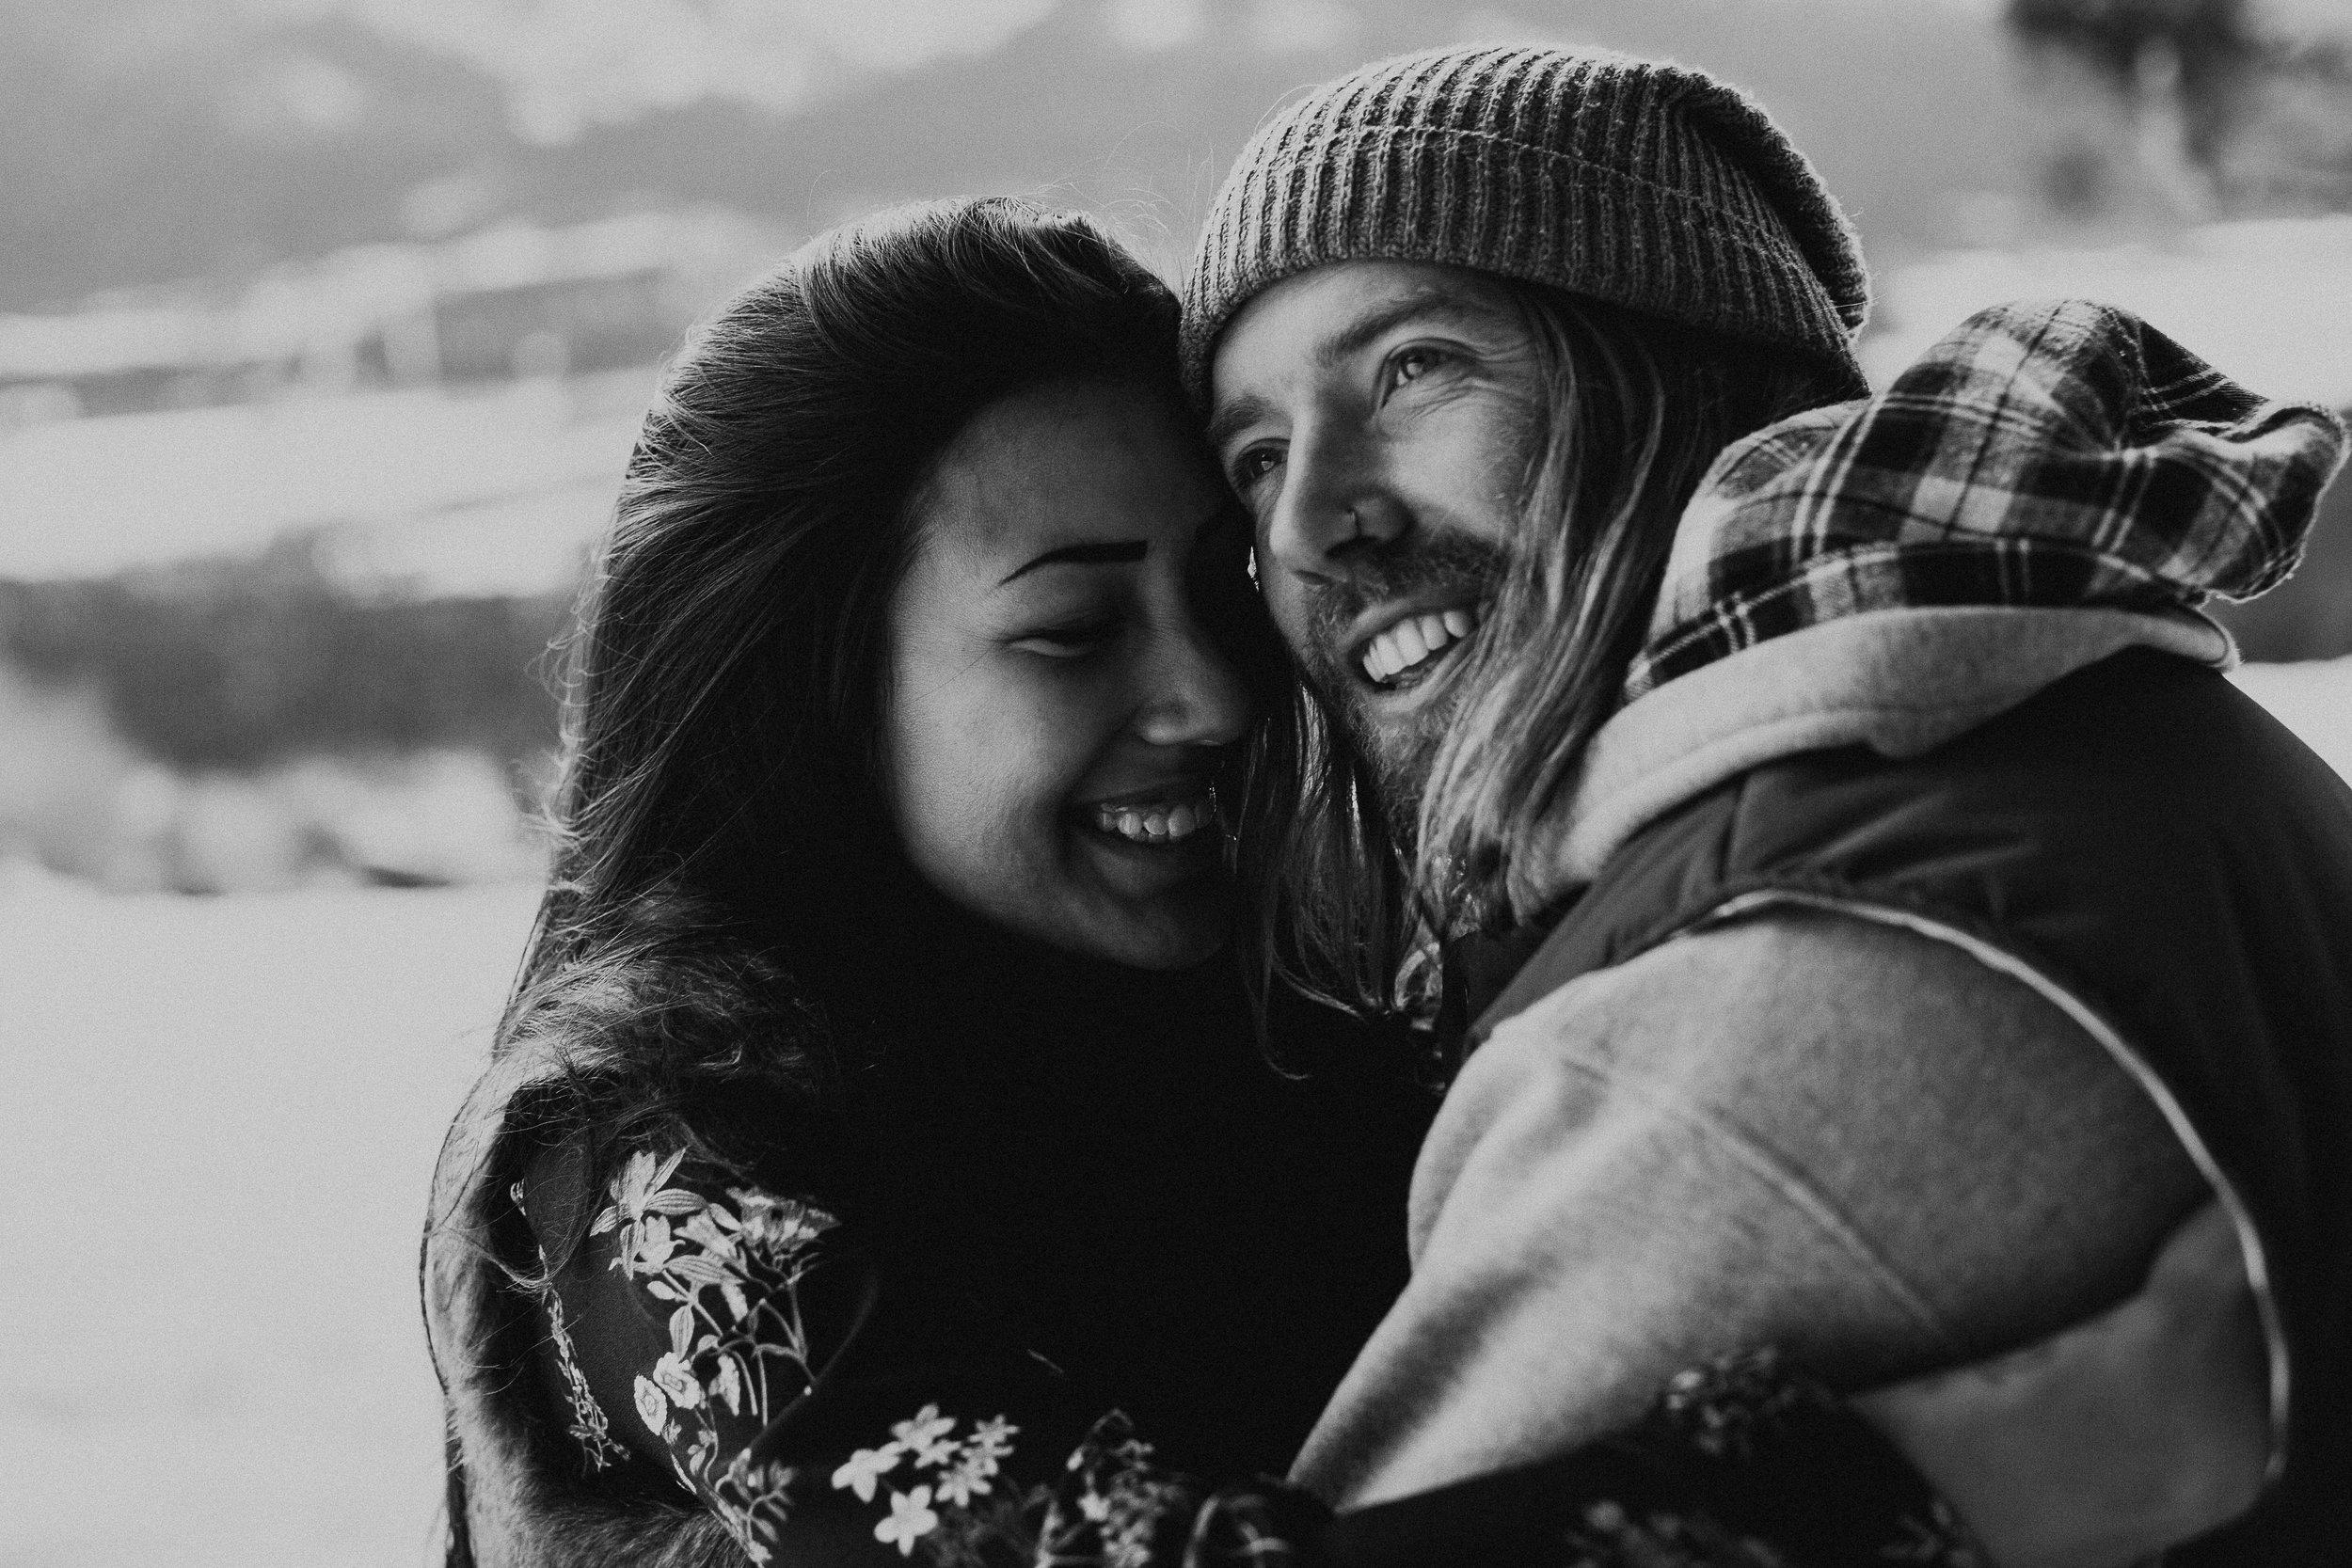 Banff Engagement Photographer - Winter Mountain Adventure Engagement Session - Michelle Larmand Photography-068